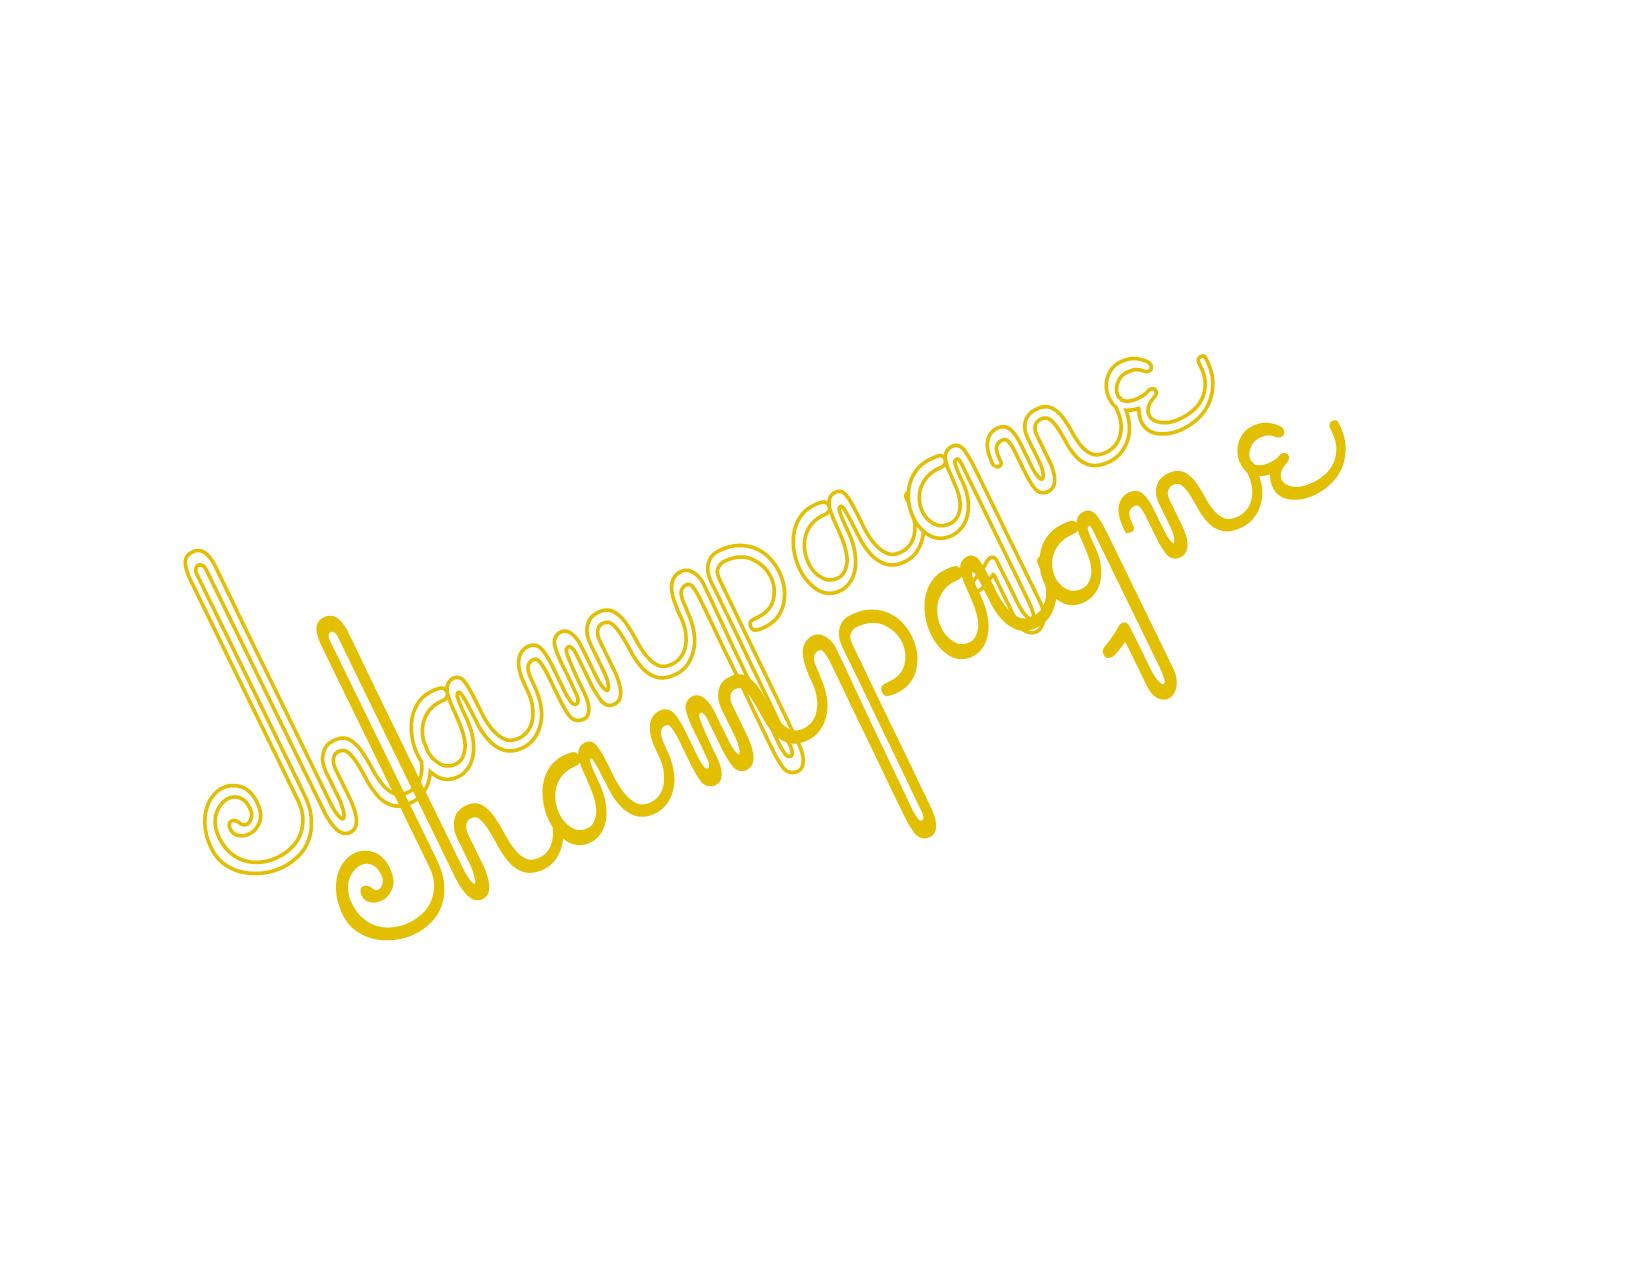 ChampagneChampagne_LOGO_12.8.17_WEBSITE.jpg